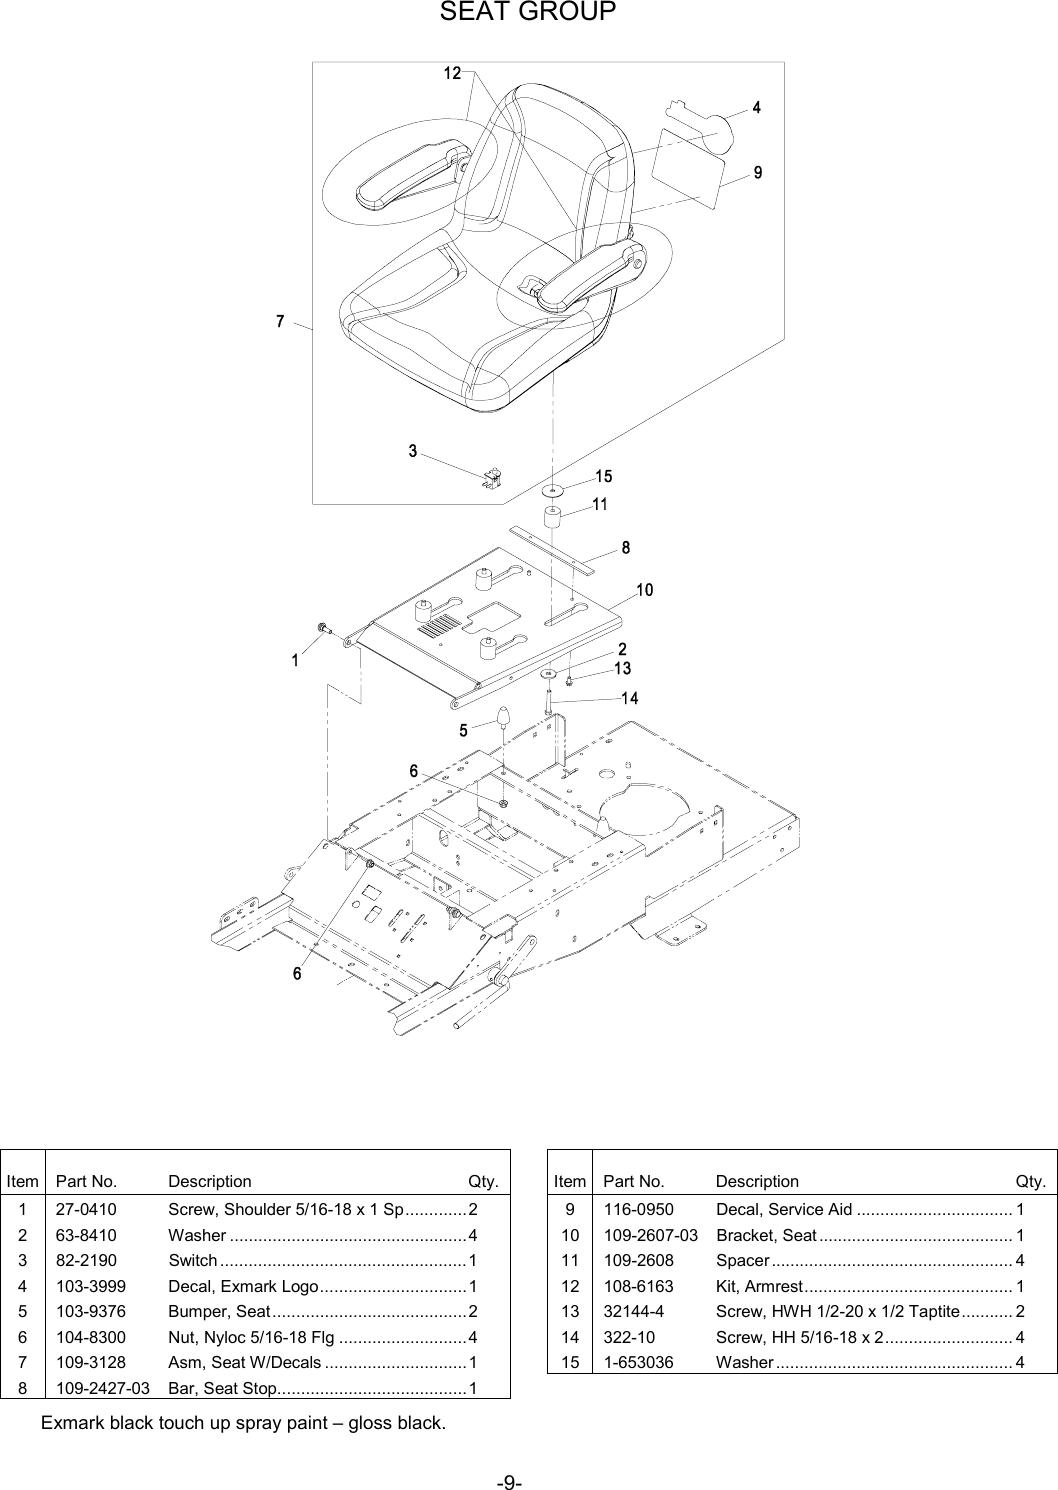 Exmark Phazer 4500 461 Users Manual